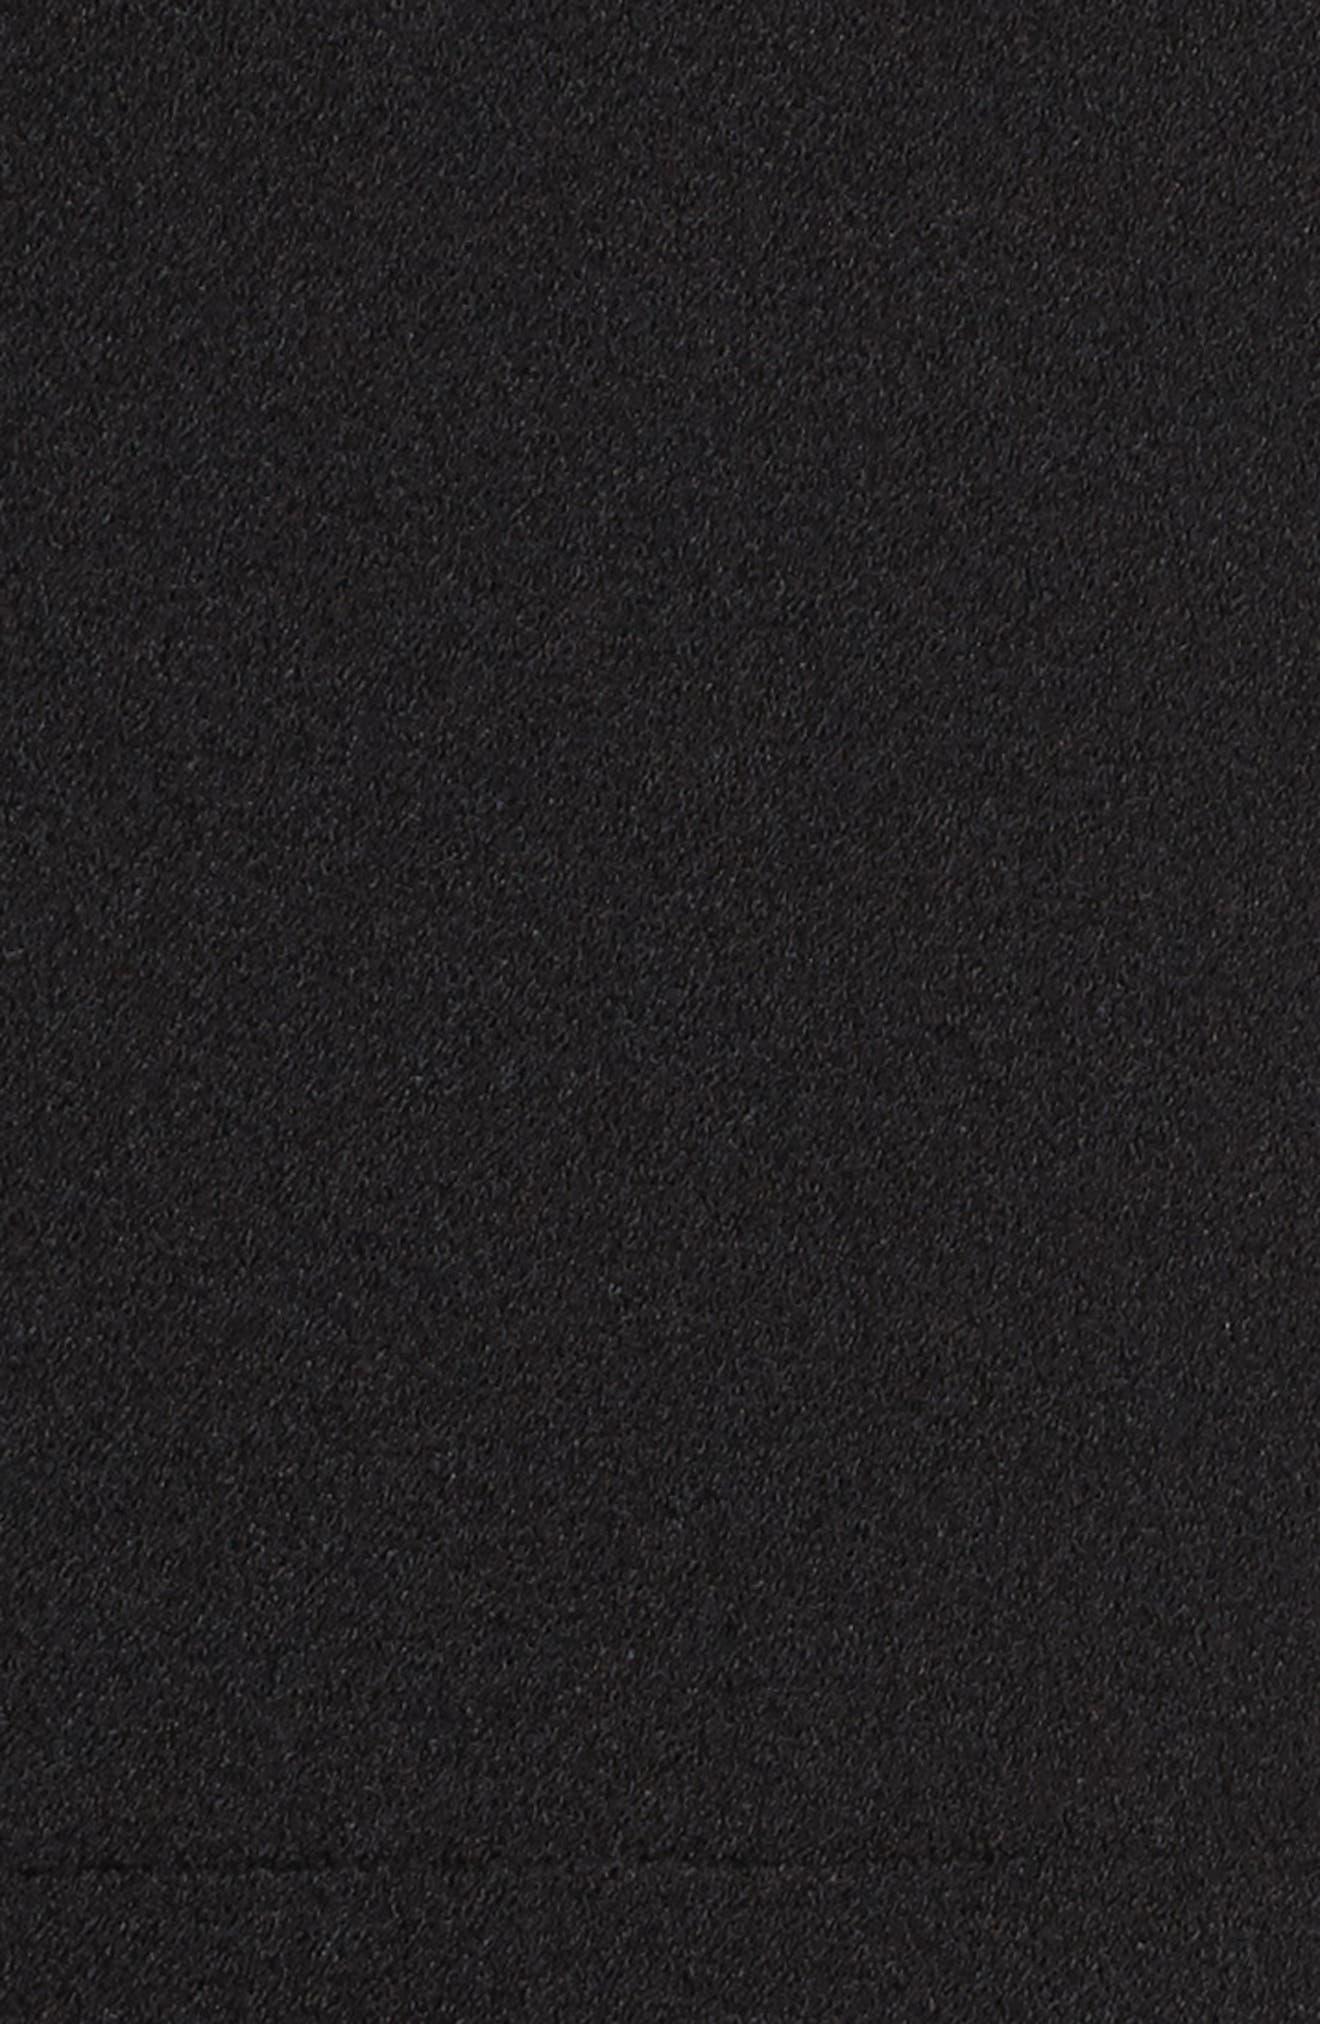 Bell Sleeve Jumpsuit,                             Alternate thumbnail 5, color,                             Black